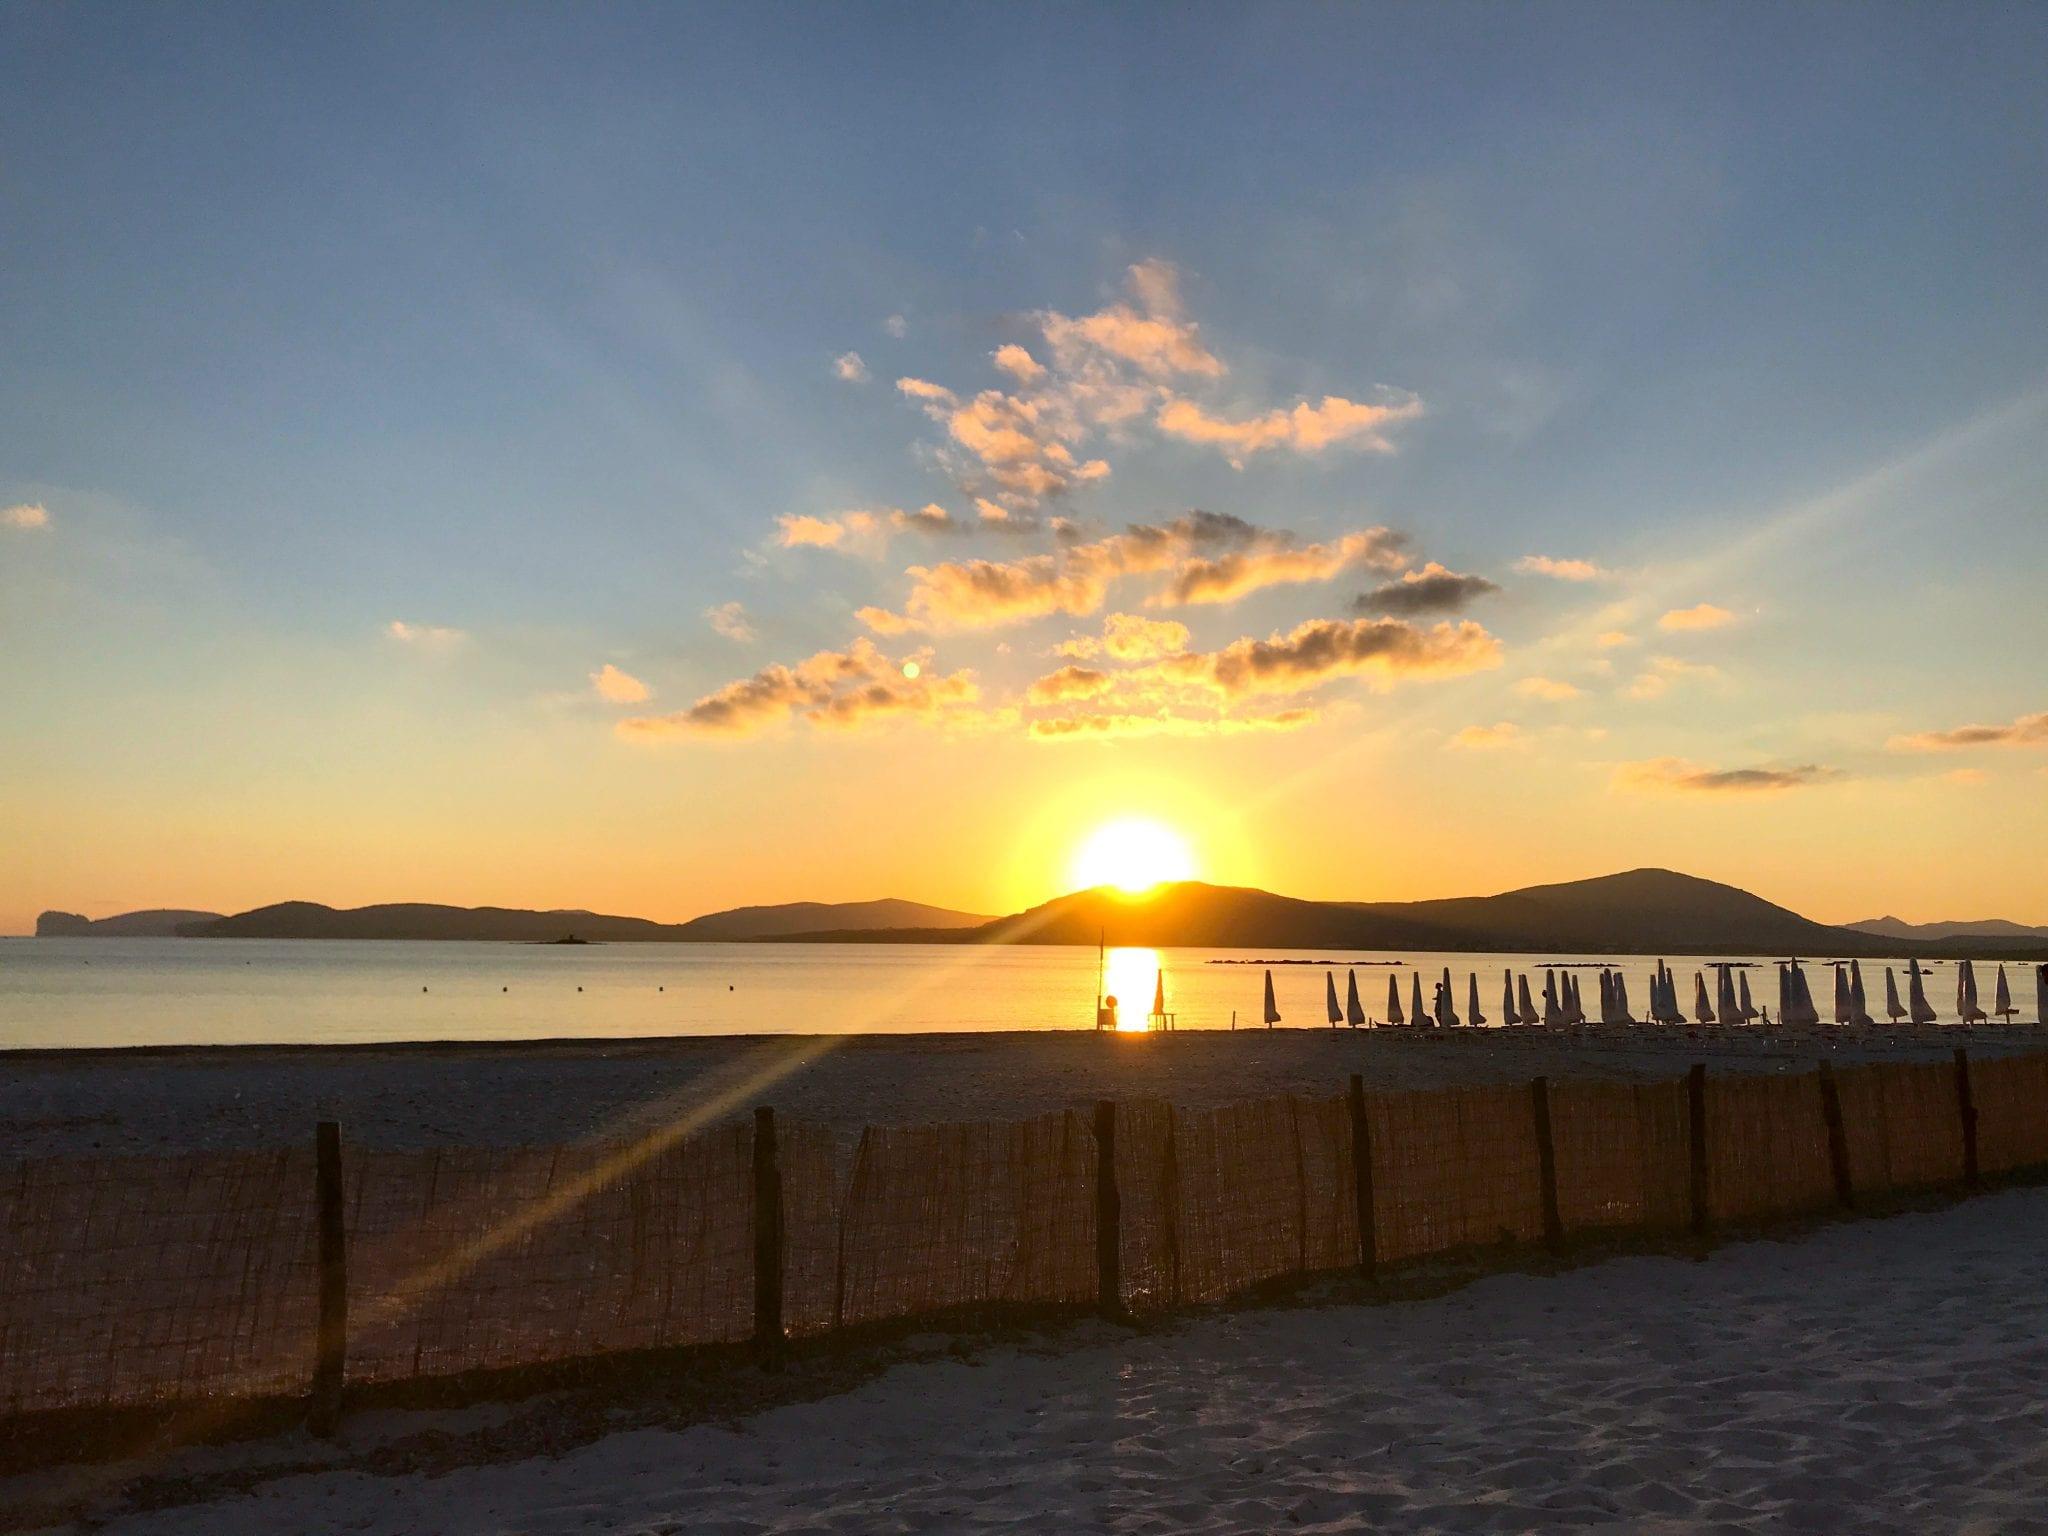 tramonto su alghero - le plume